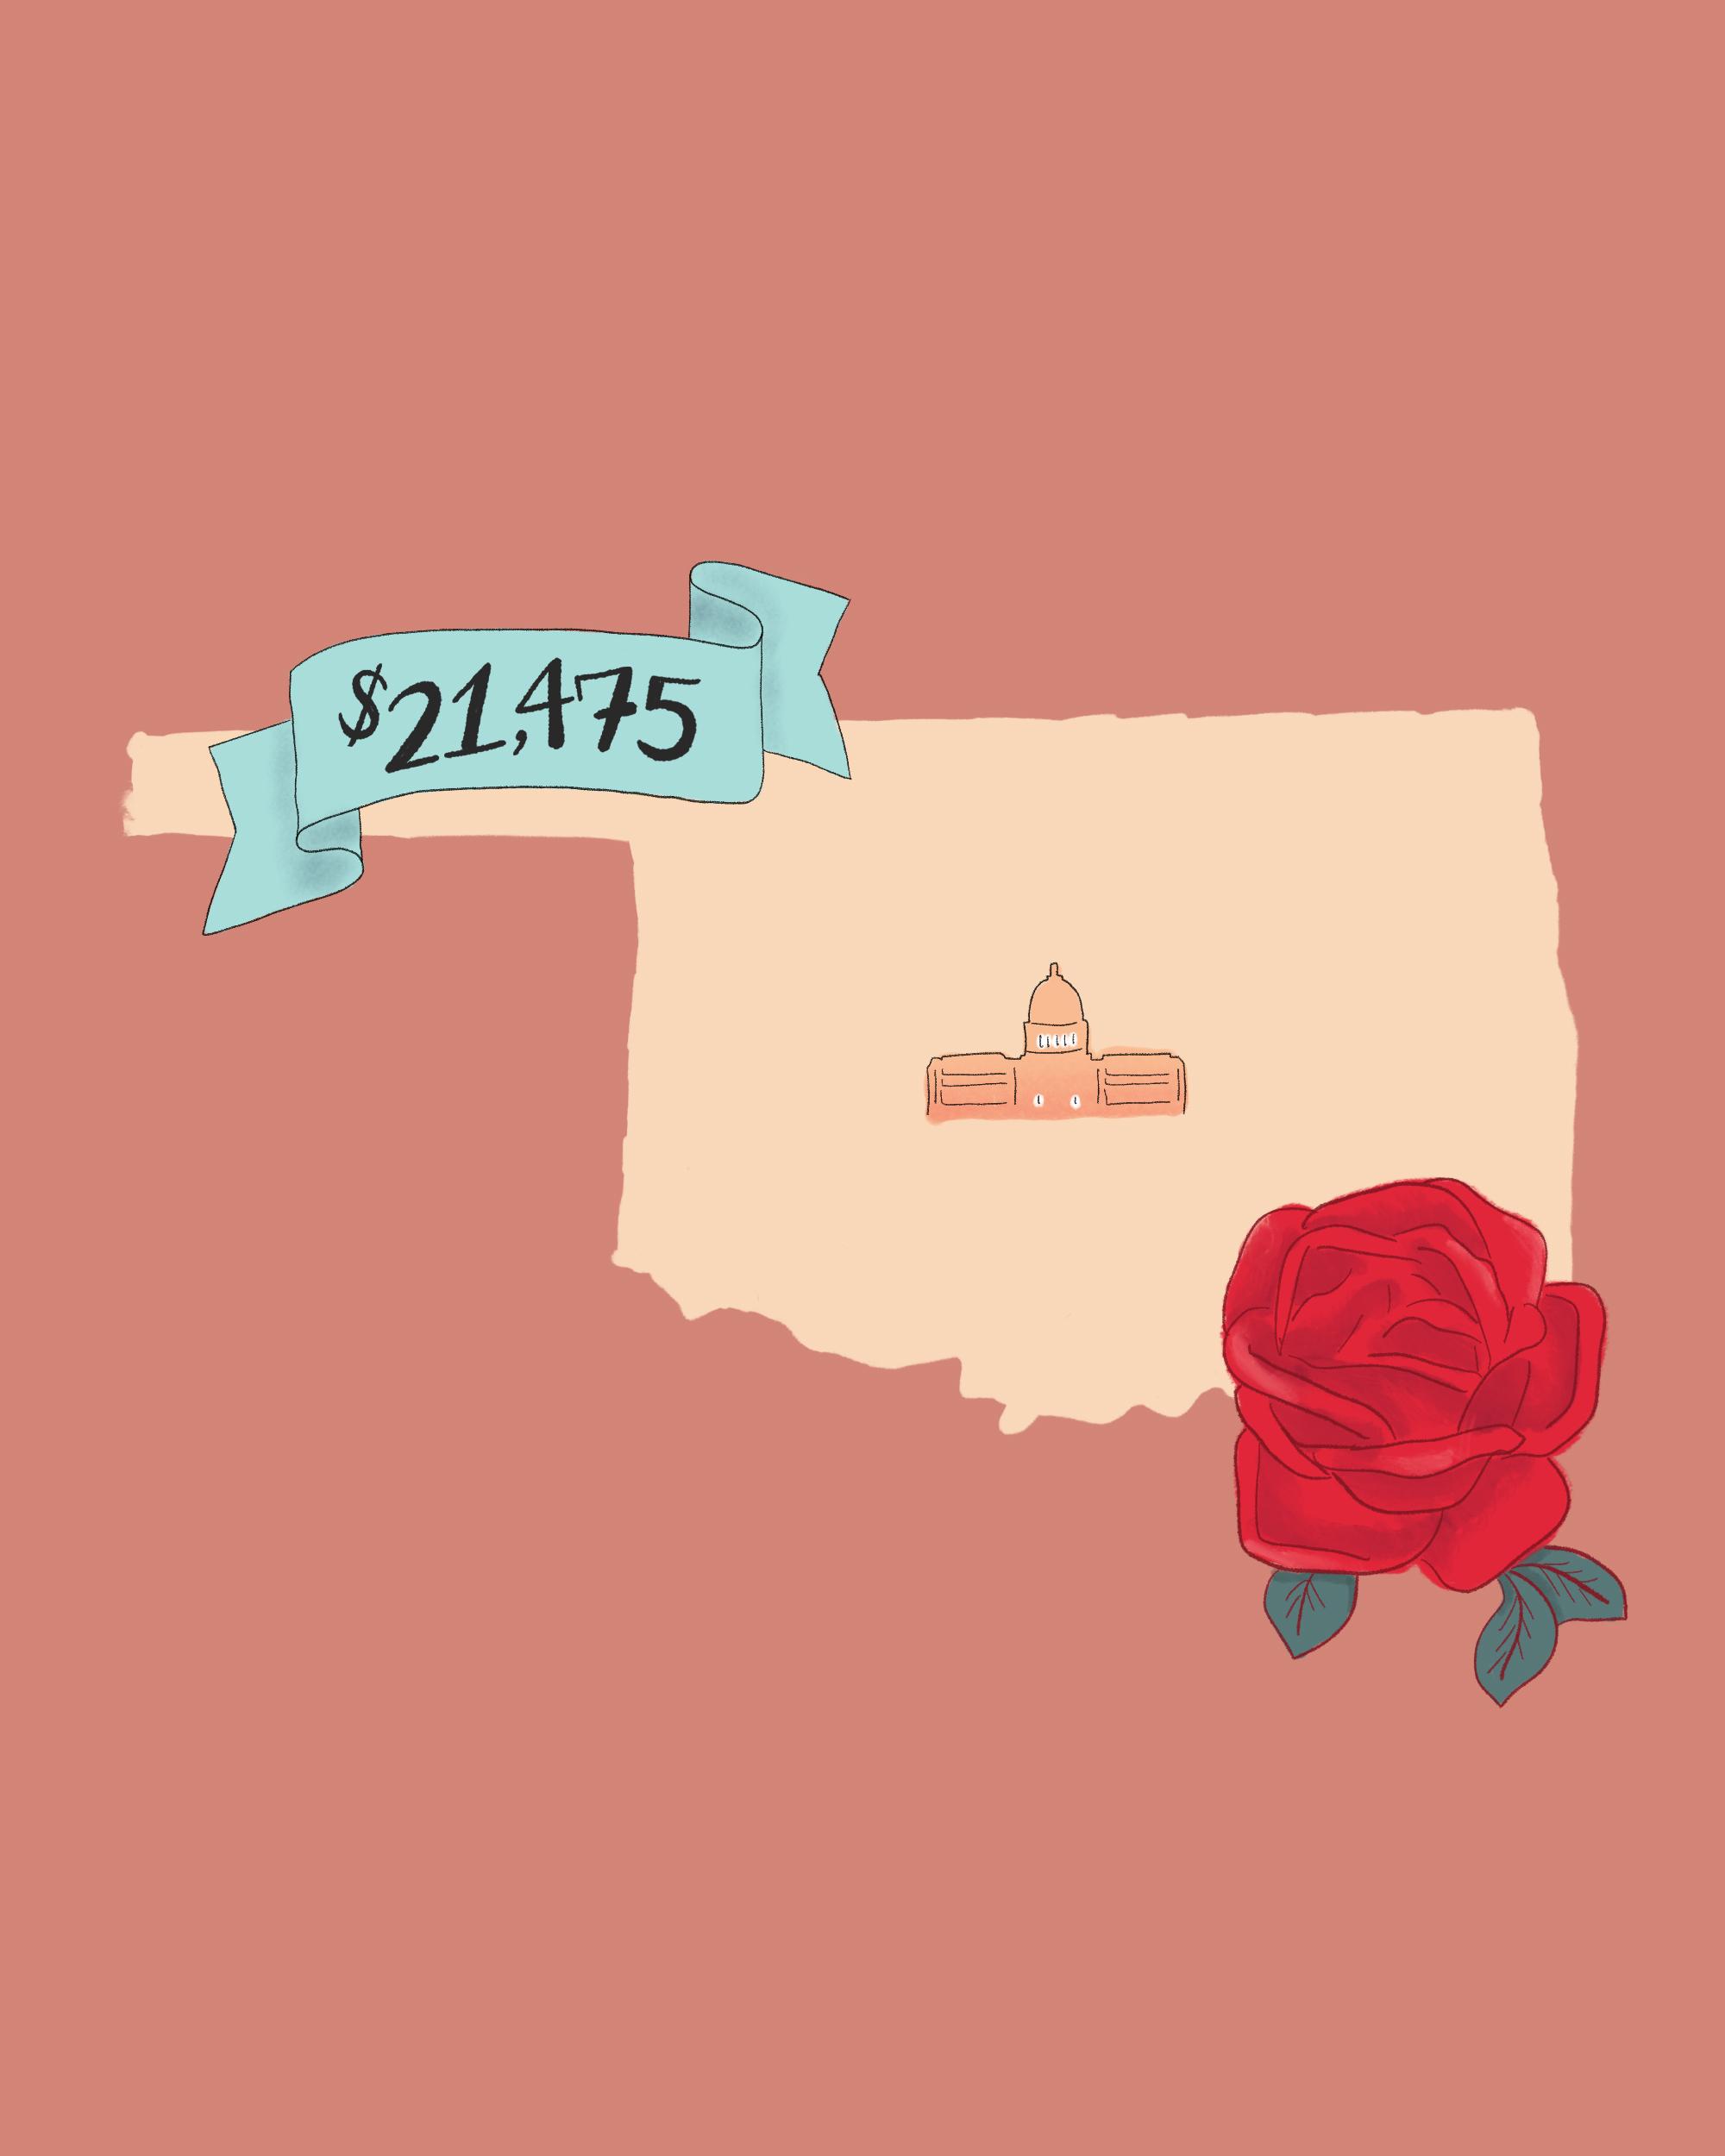 state wedding costs illustration oklahoma